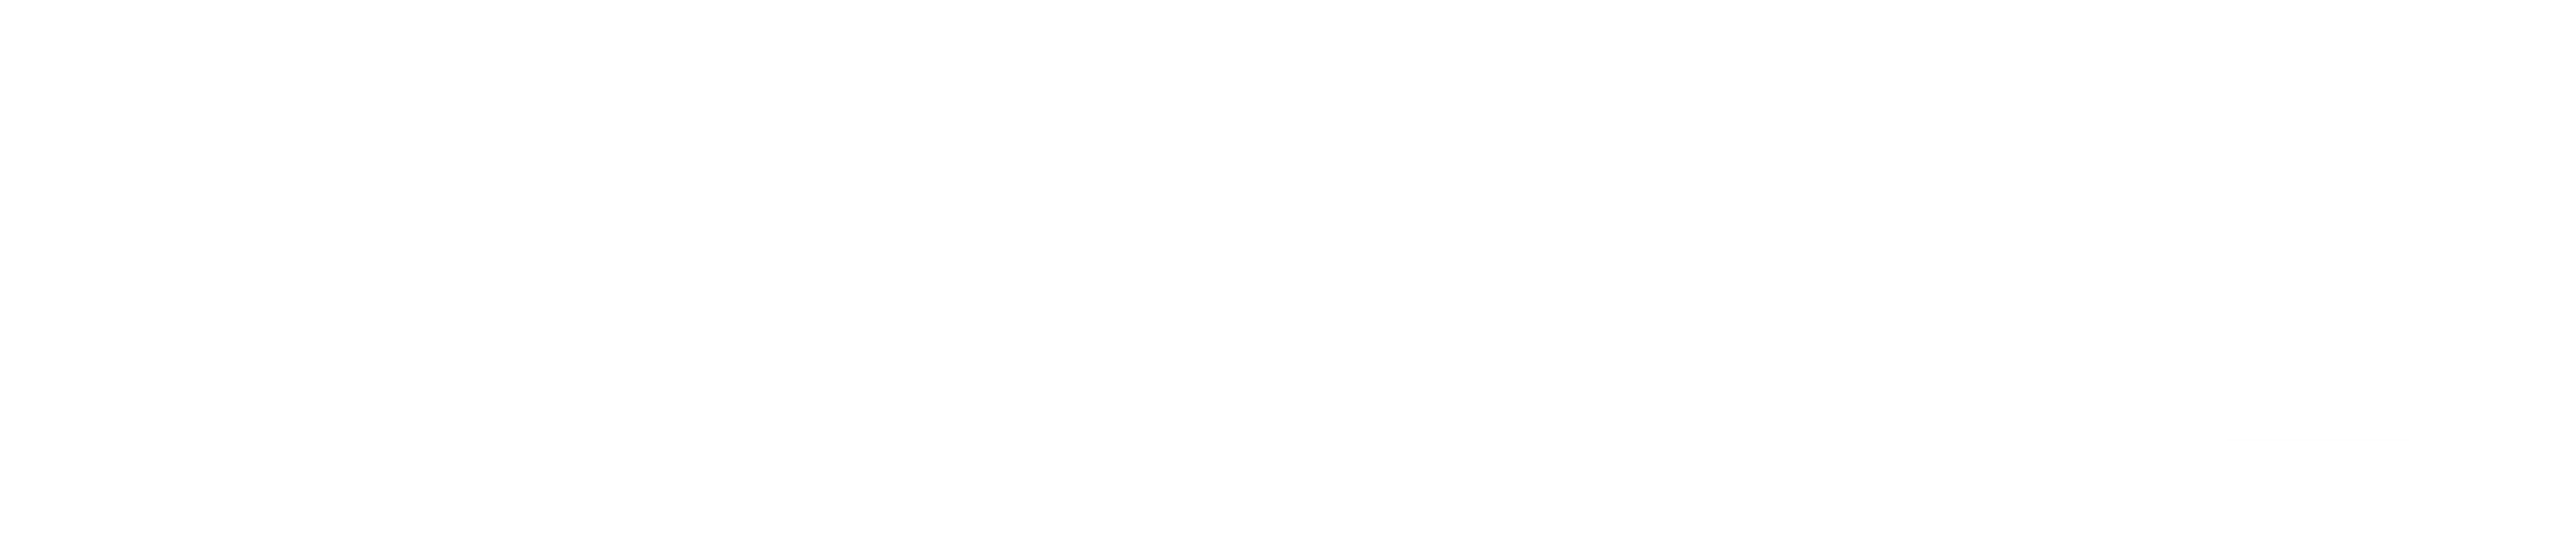 SXdrv logo